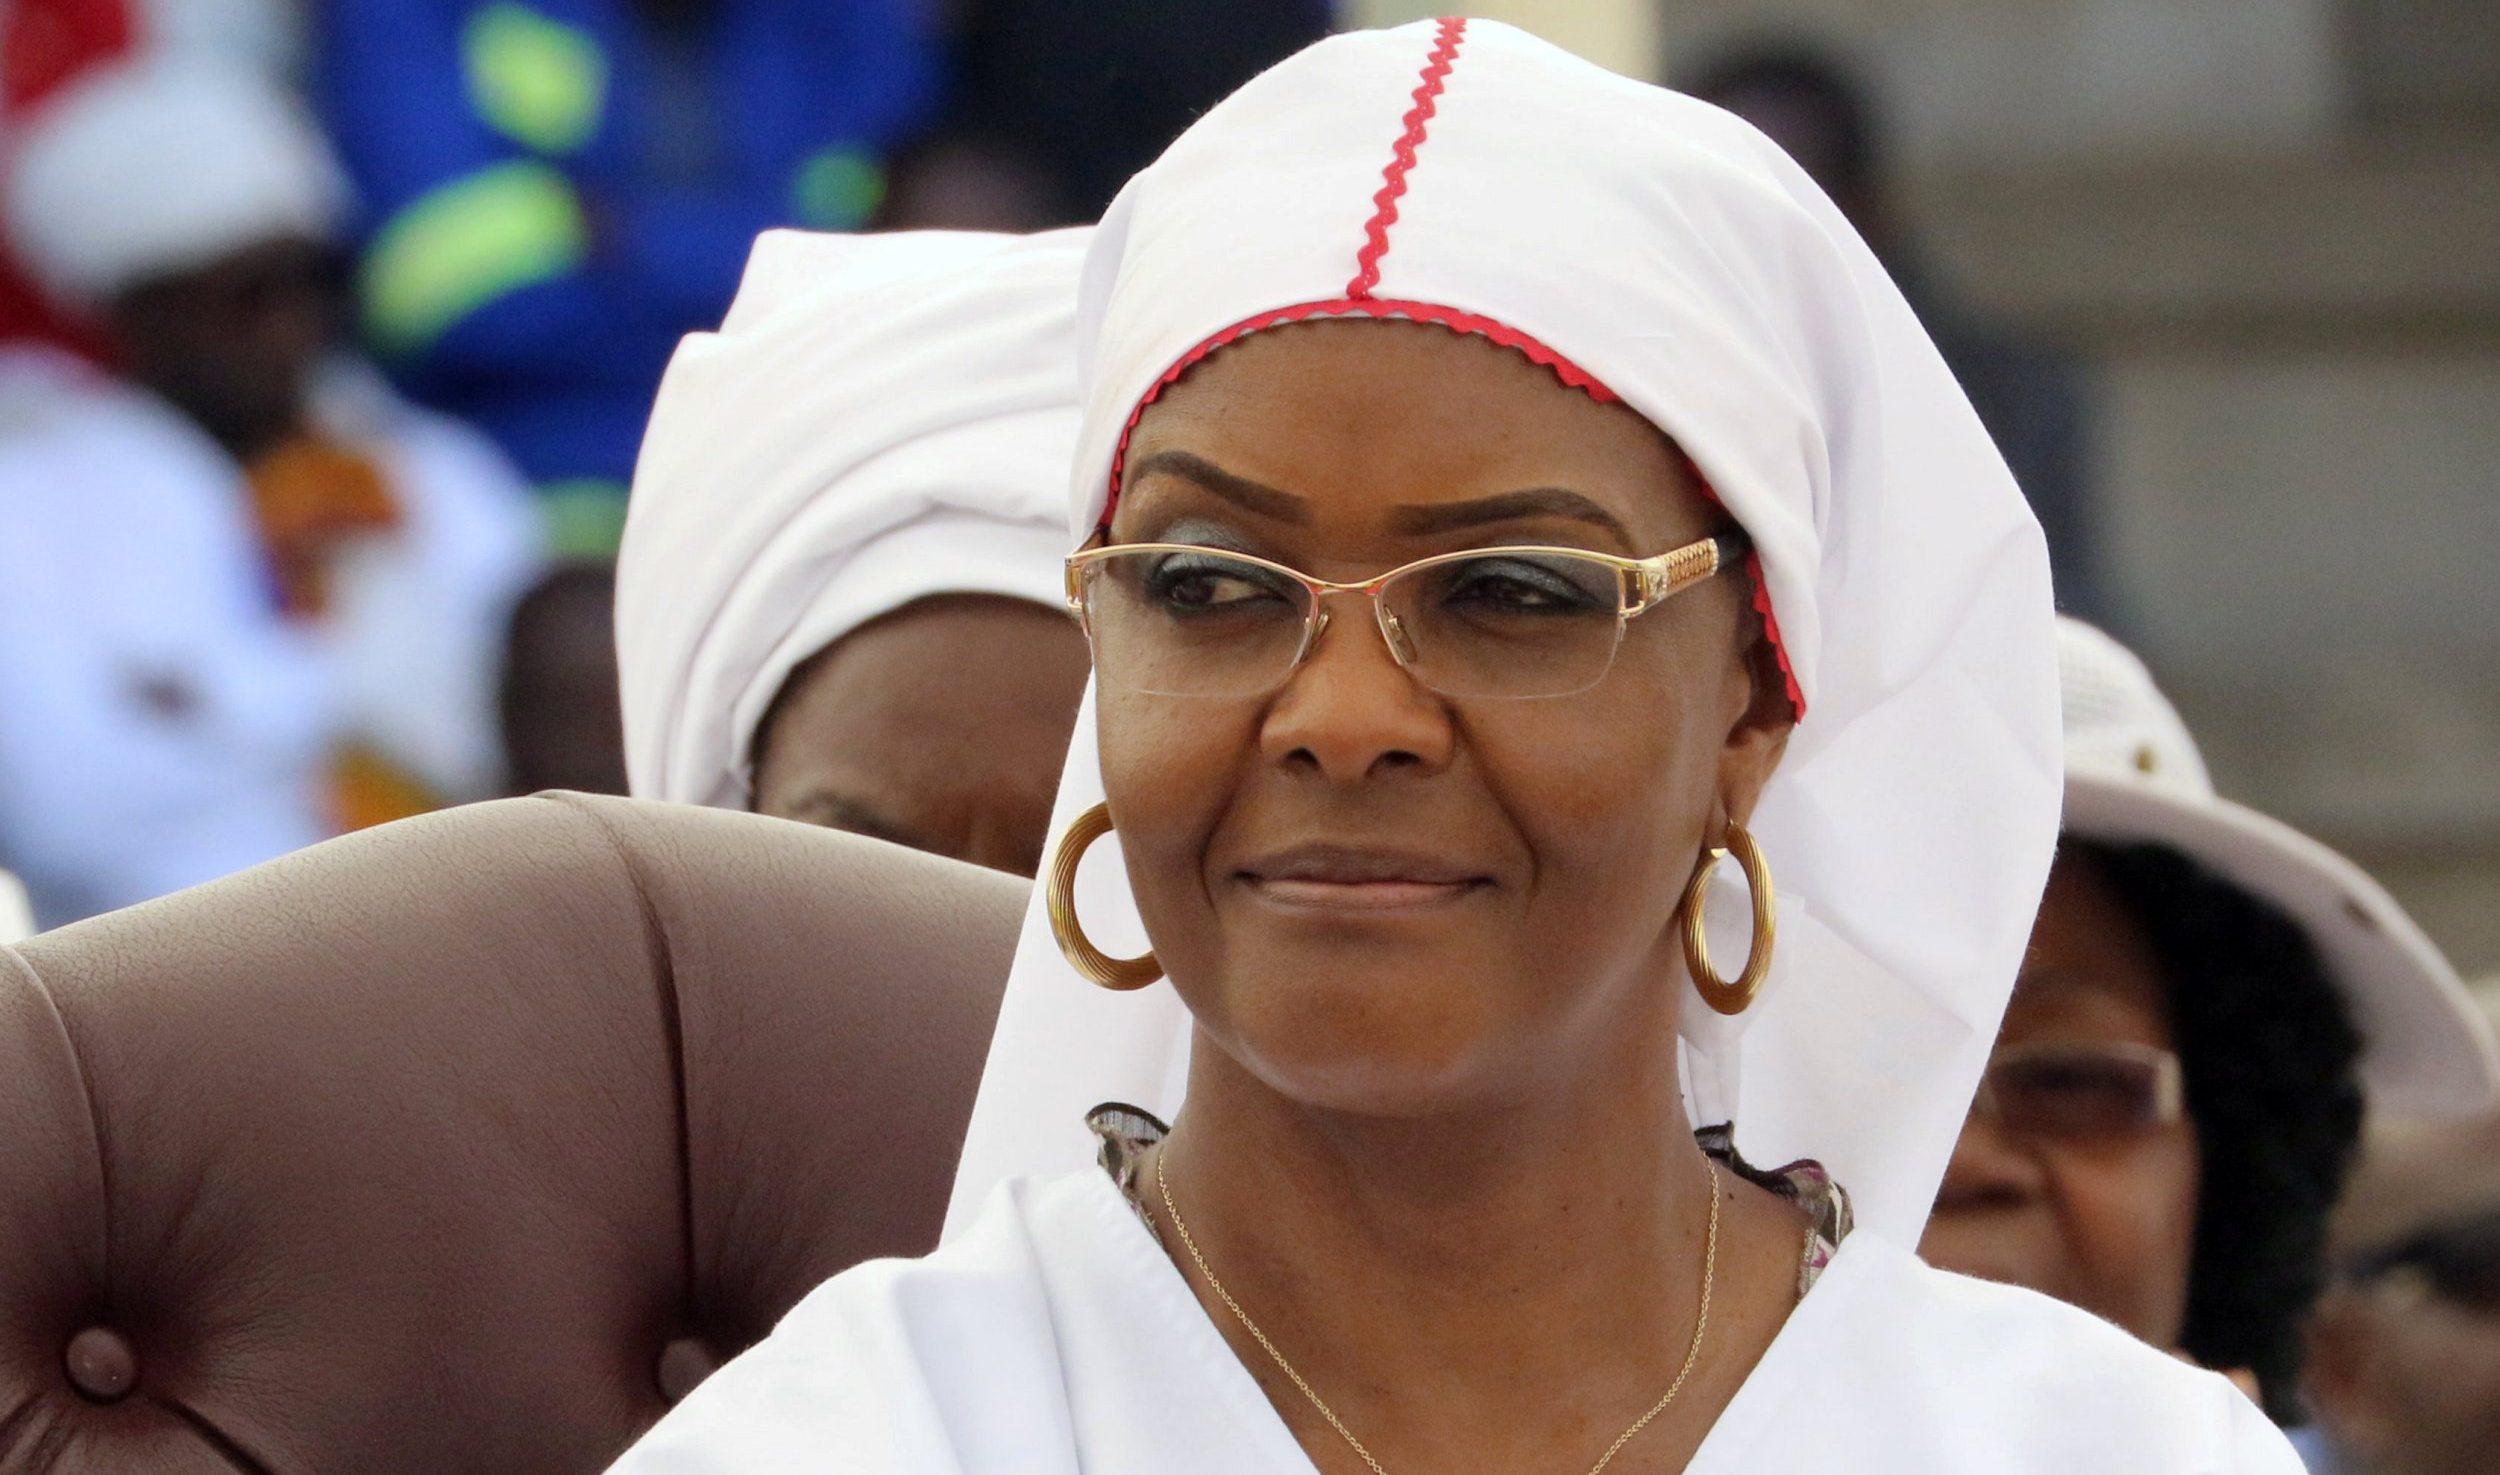 Zimbabwean President Robert Mugabe's wife Grace Mugabe